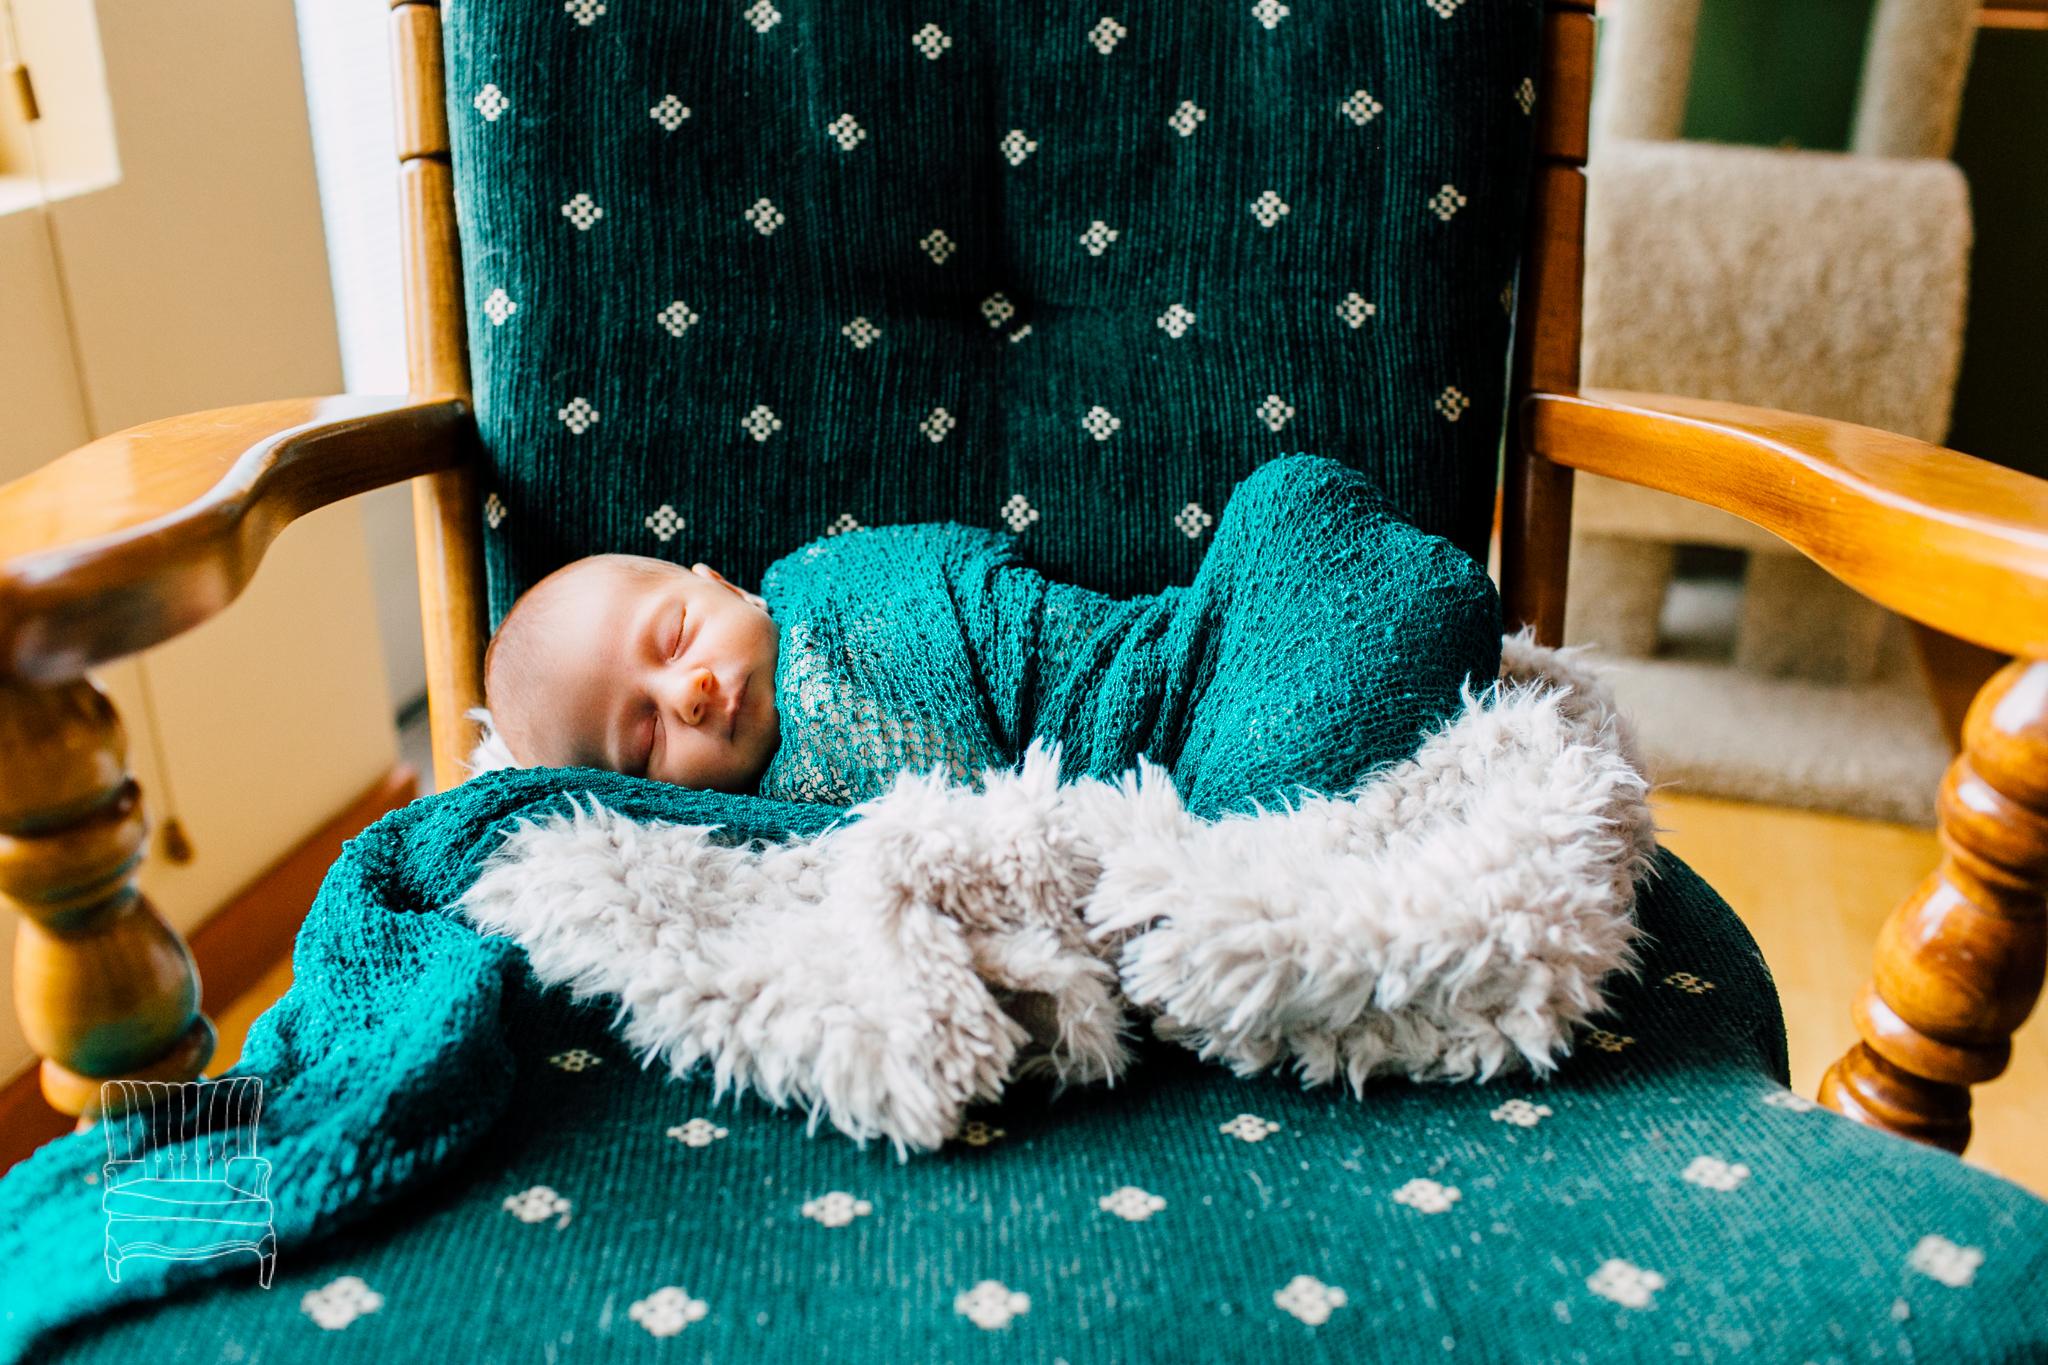 belligham-newborn-photographer-katheyrn-moran-hadley -2.jpg